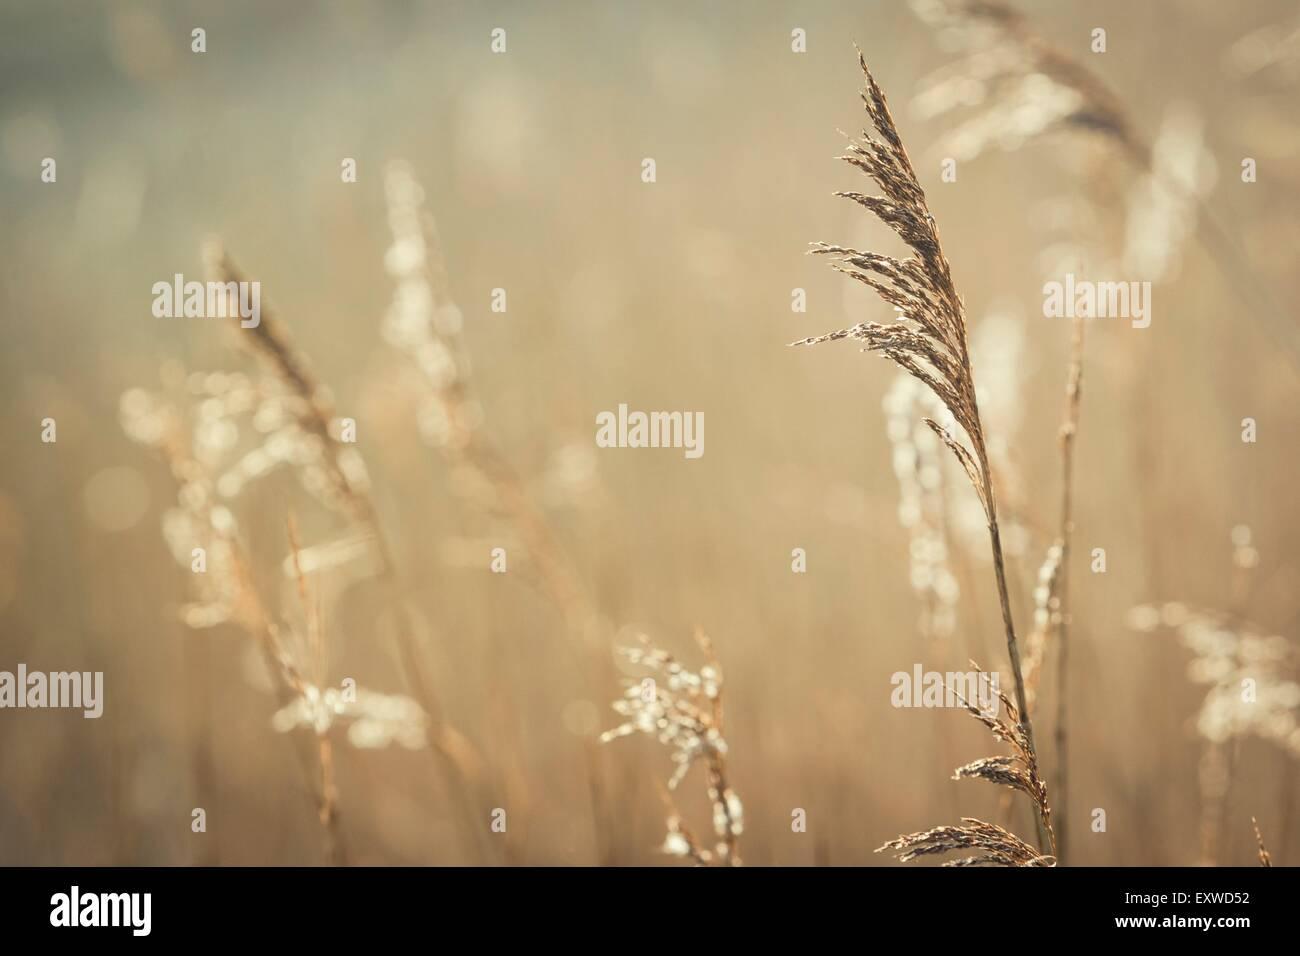 Lames en roseau flétri soleil du matin Photo Stock